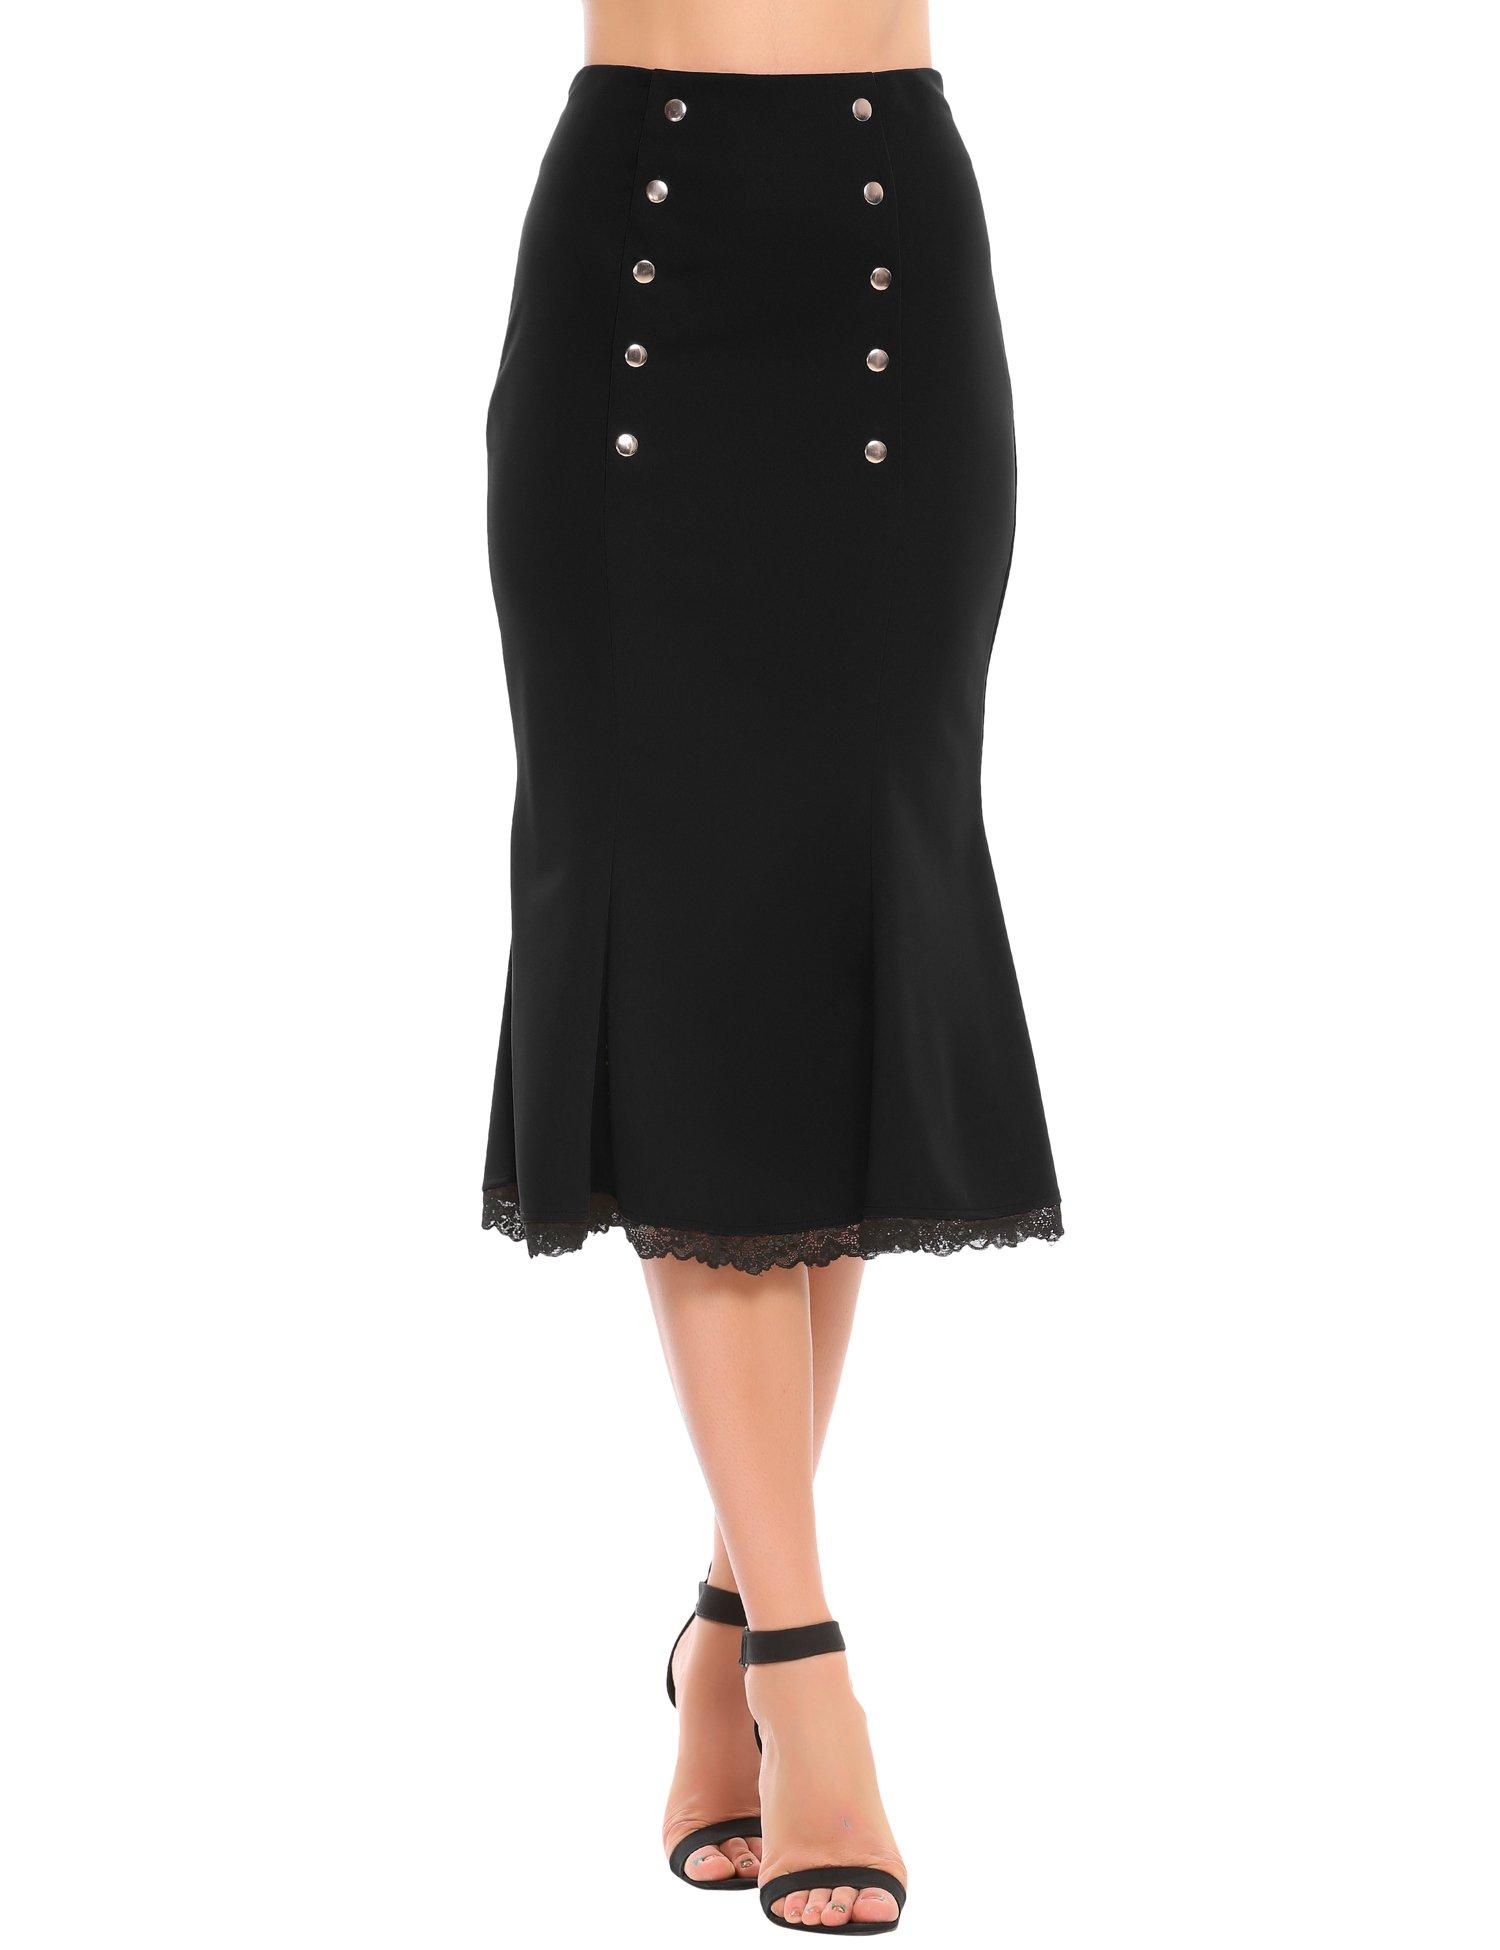 Zeagoo Women's Slim Fit High Waist Party Work Mermaid Bodycon Pencil Midi Skirt(XL,Black)